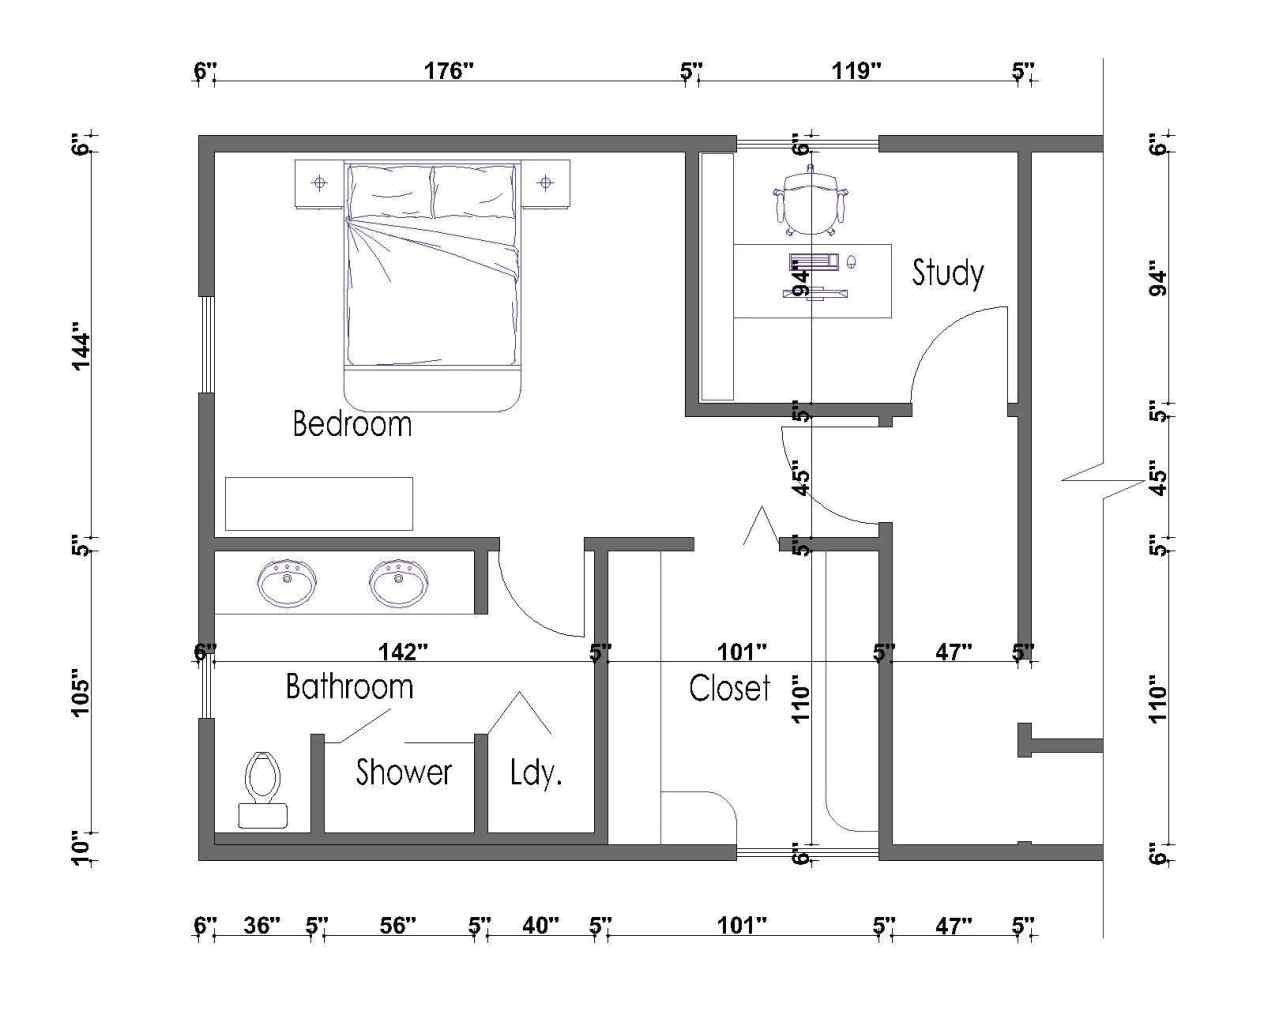 plans decor bathroom addition home design bathroom small master bedroom floor plans addition home design decoration first home small master bedroom floor jpg